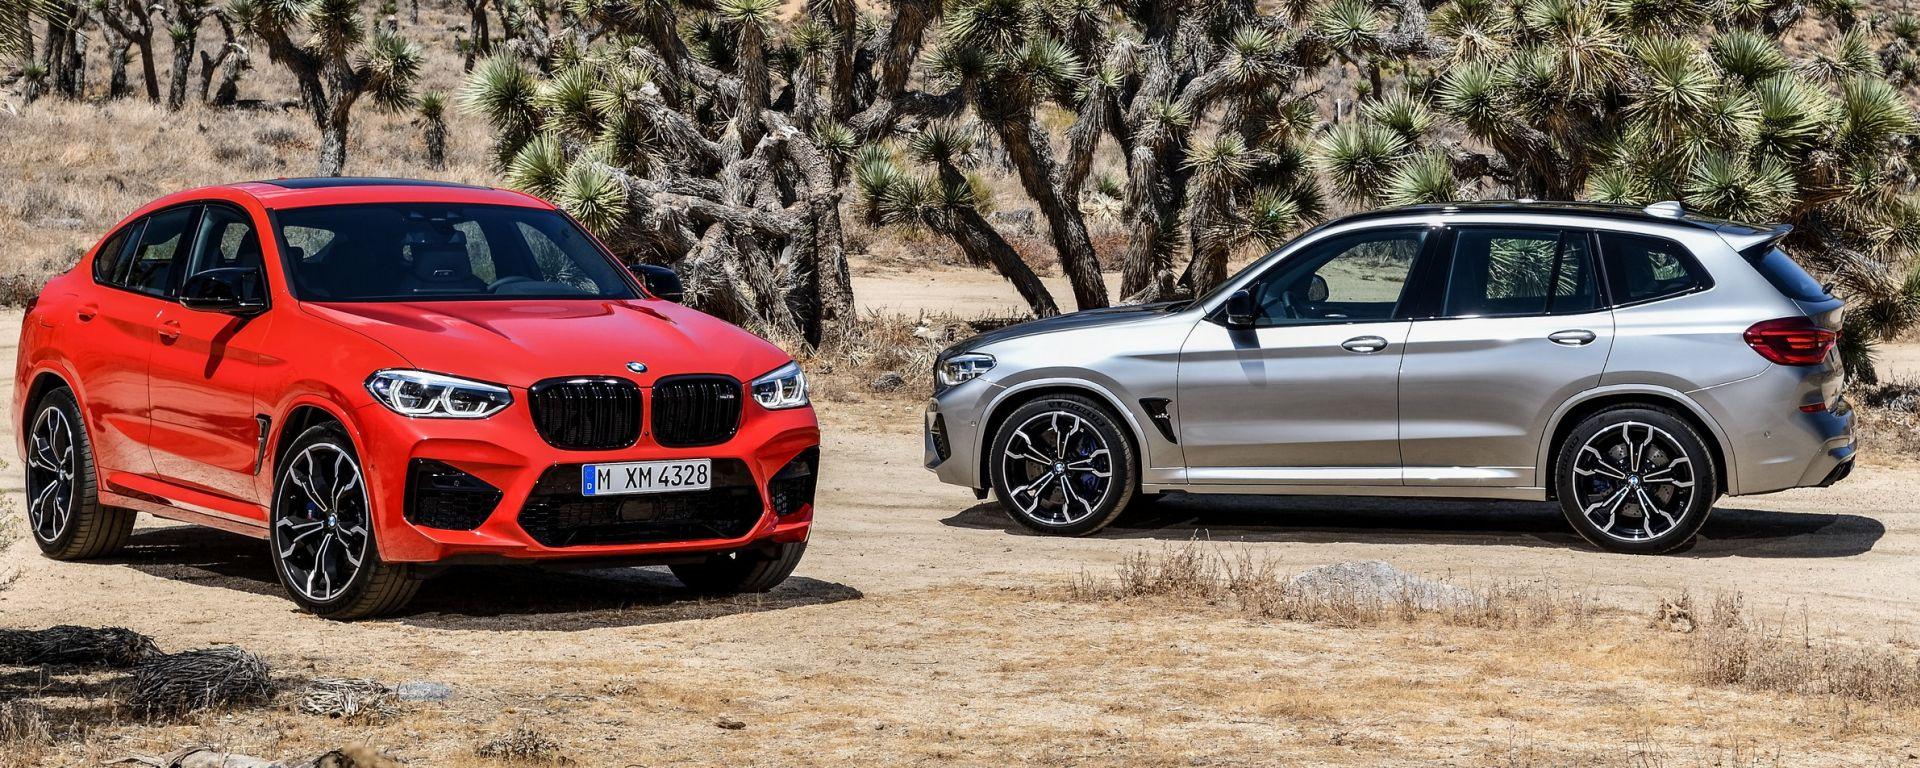 BMW X3 M e X4 M spaventano l'Alfa Romeo Stelvio Quadrifoglio